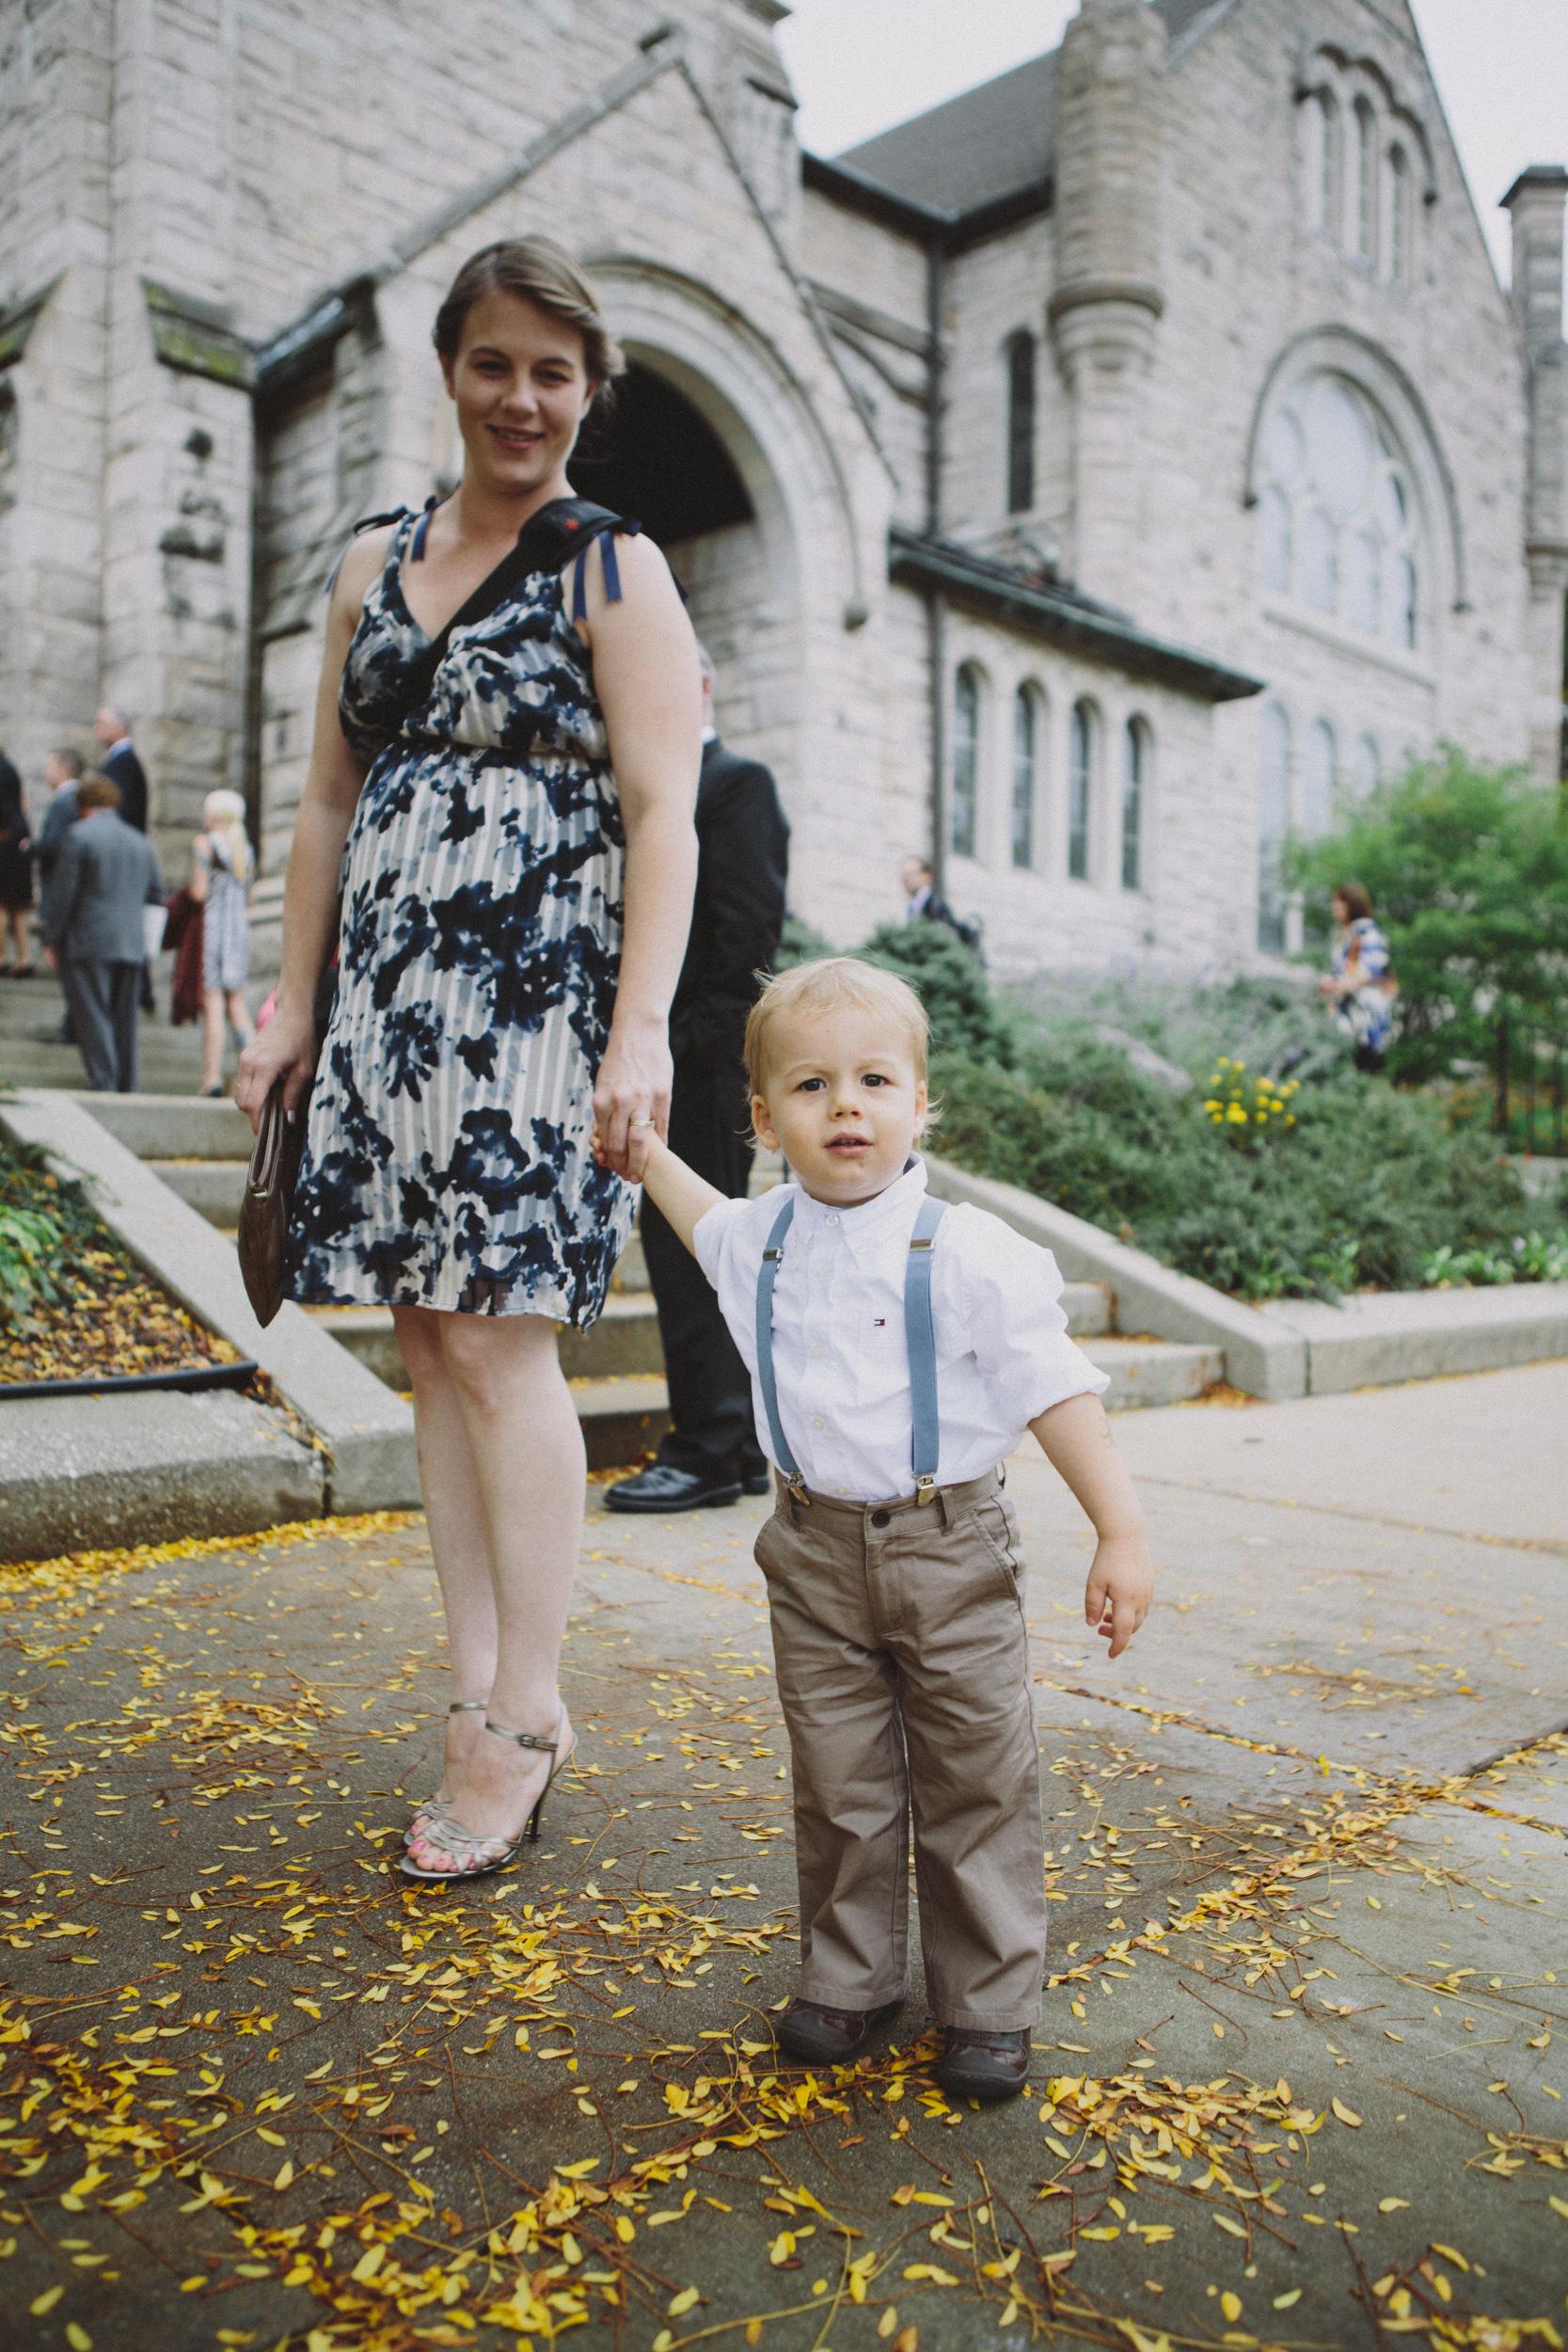 10-05-2013 maggie & adam wedding photography by brian milo-119.jpg